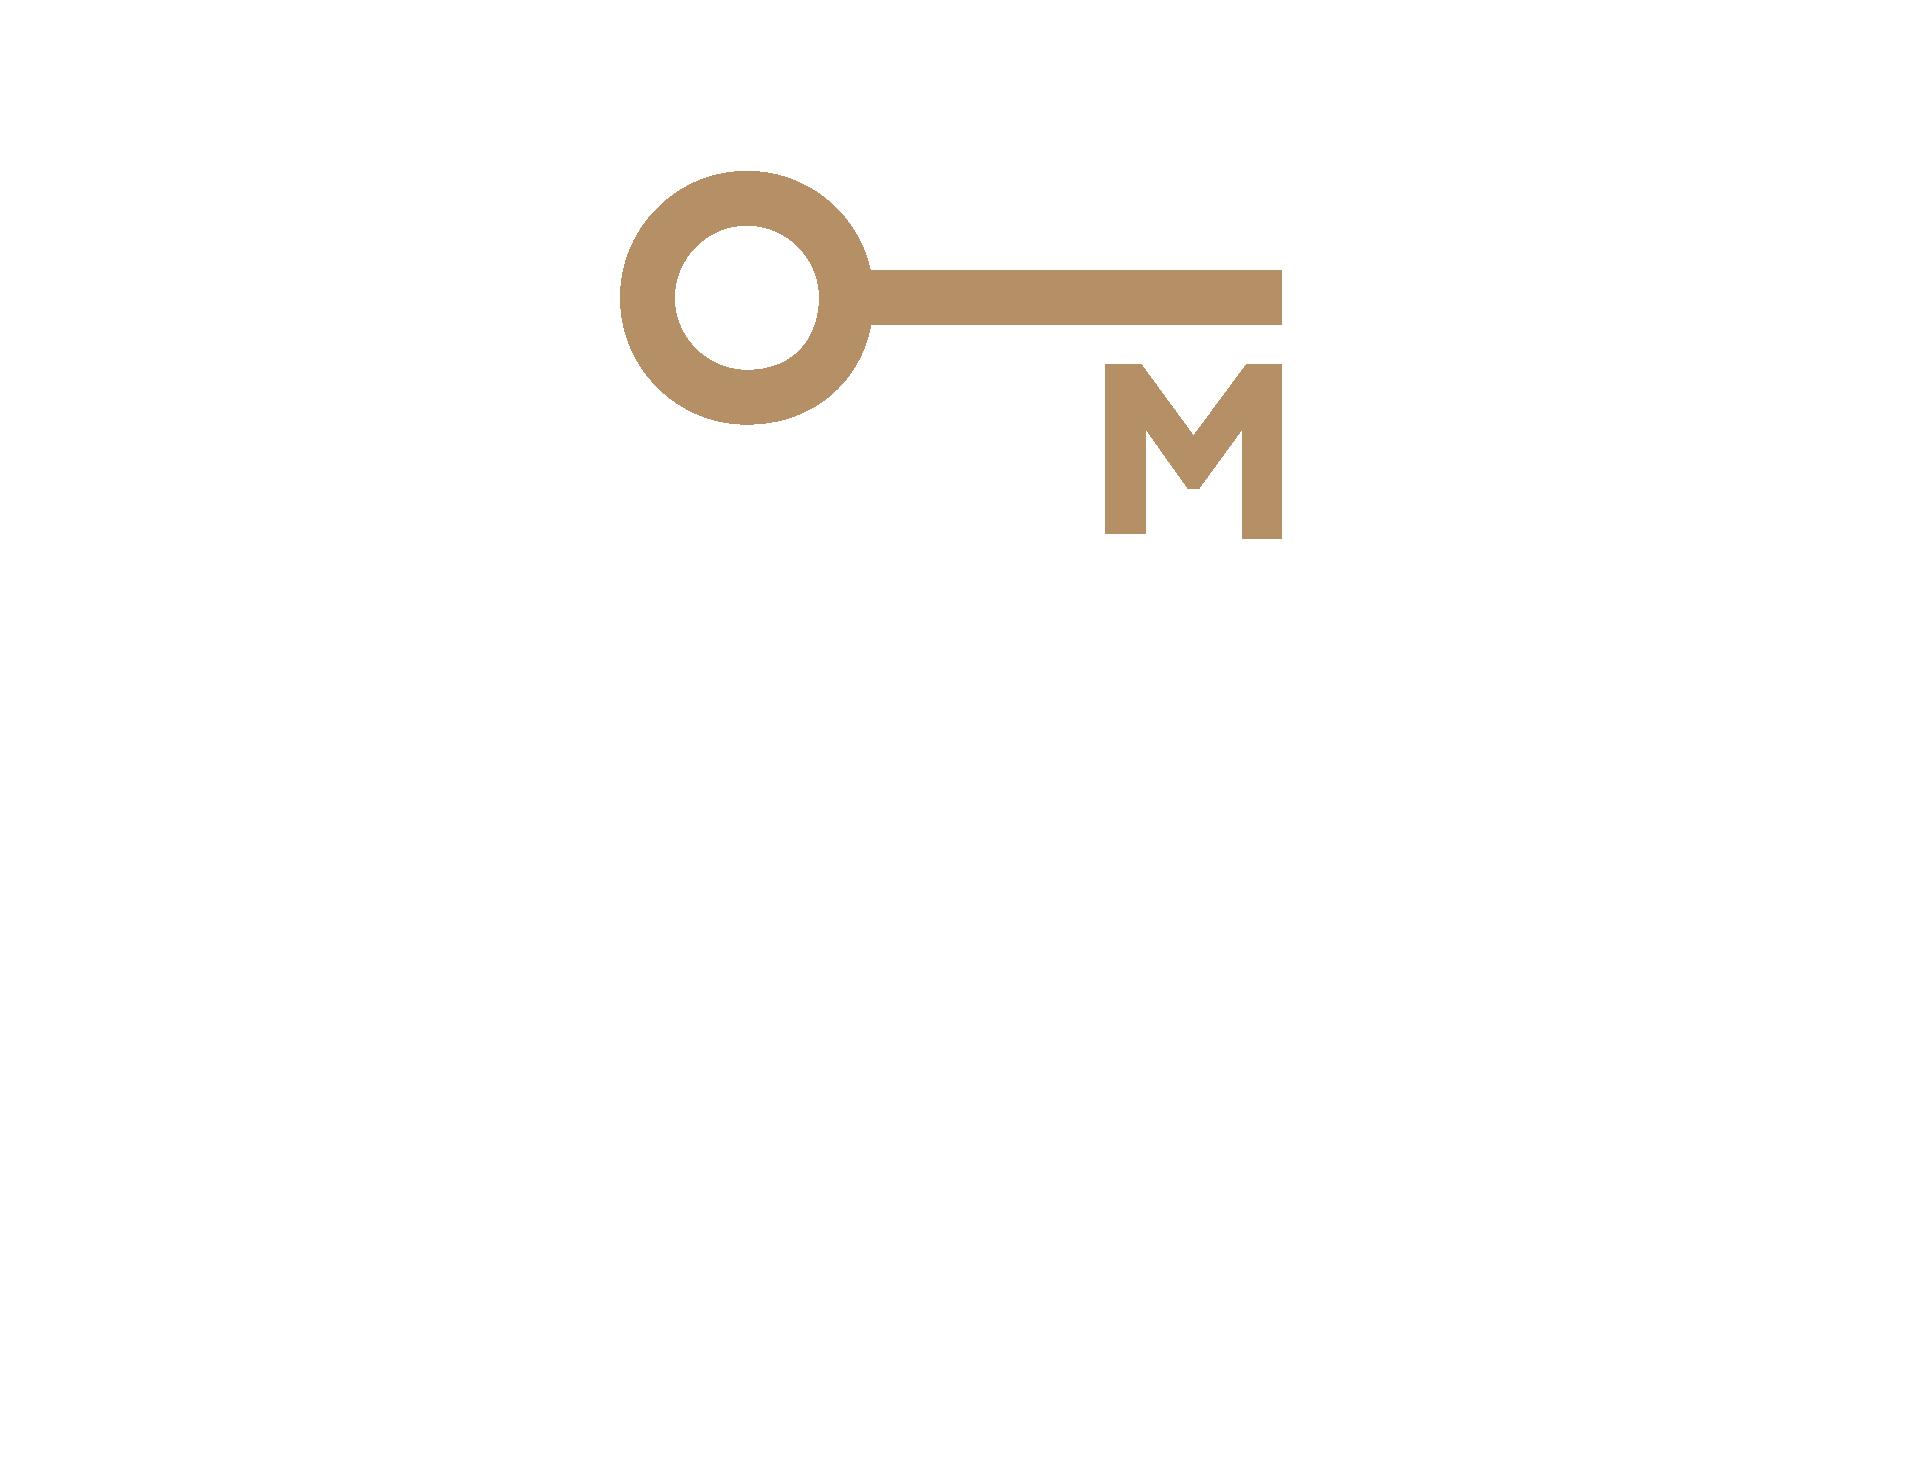 Memberslounge.com